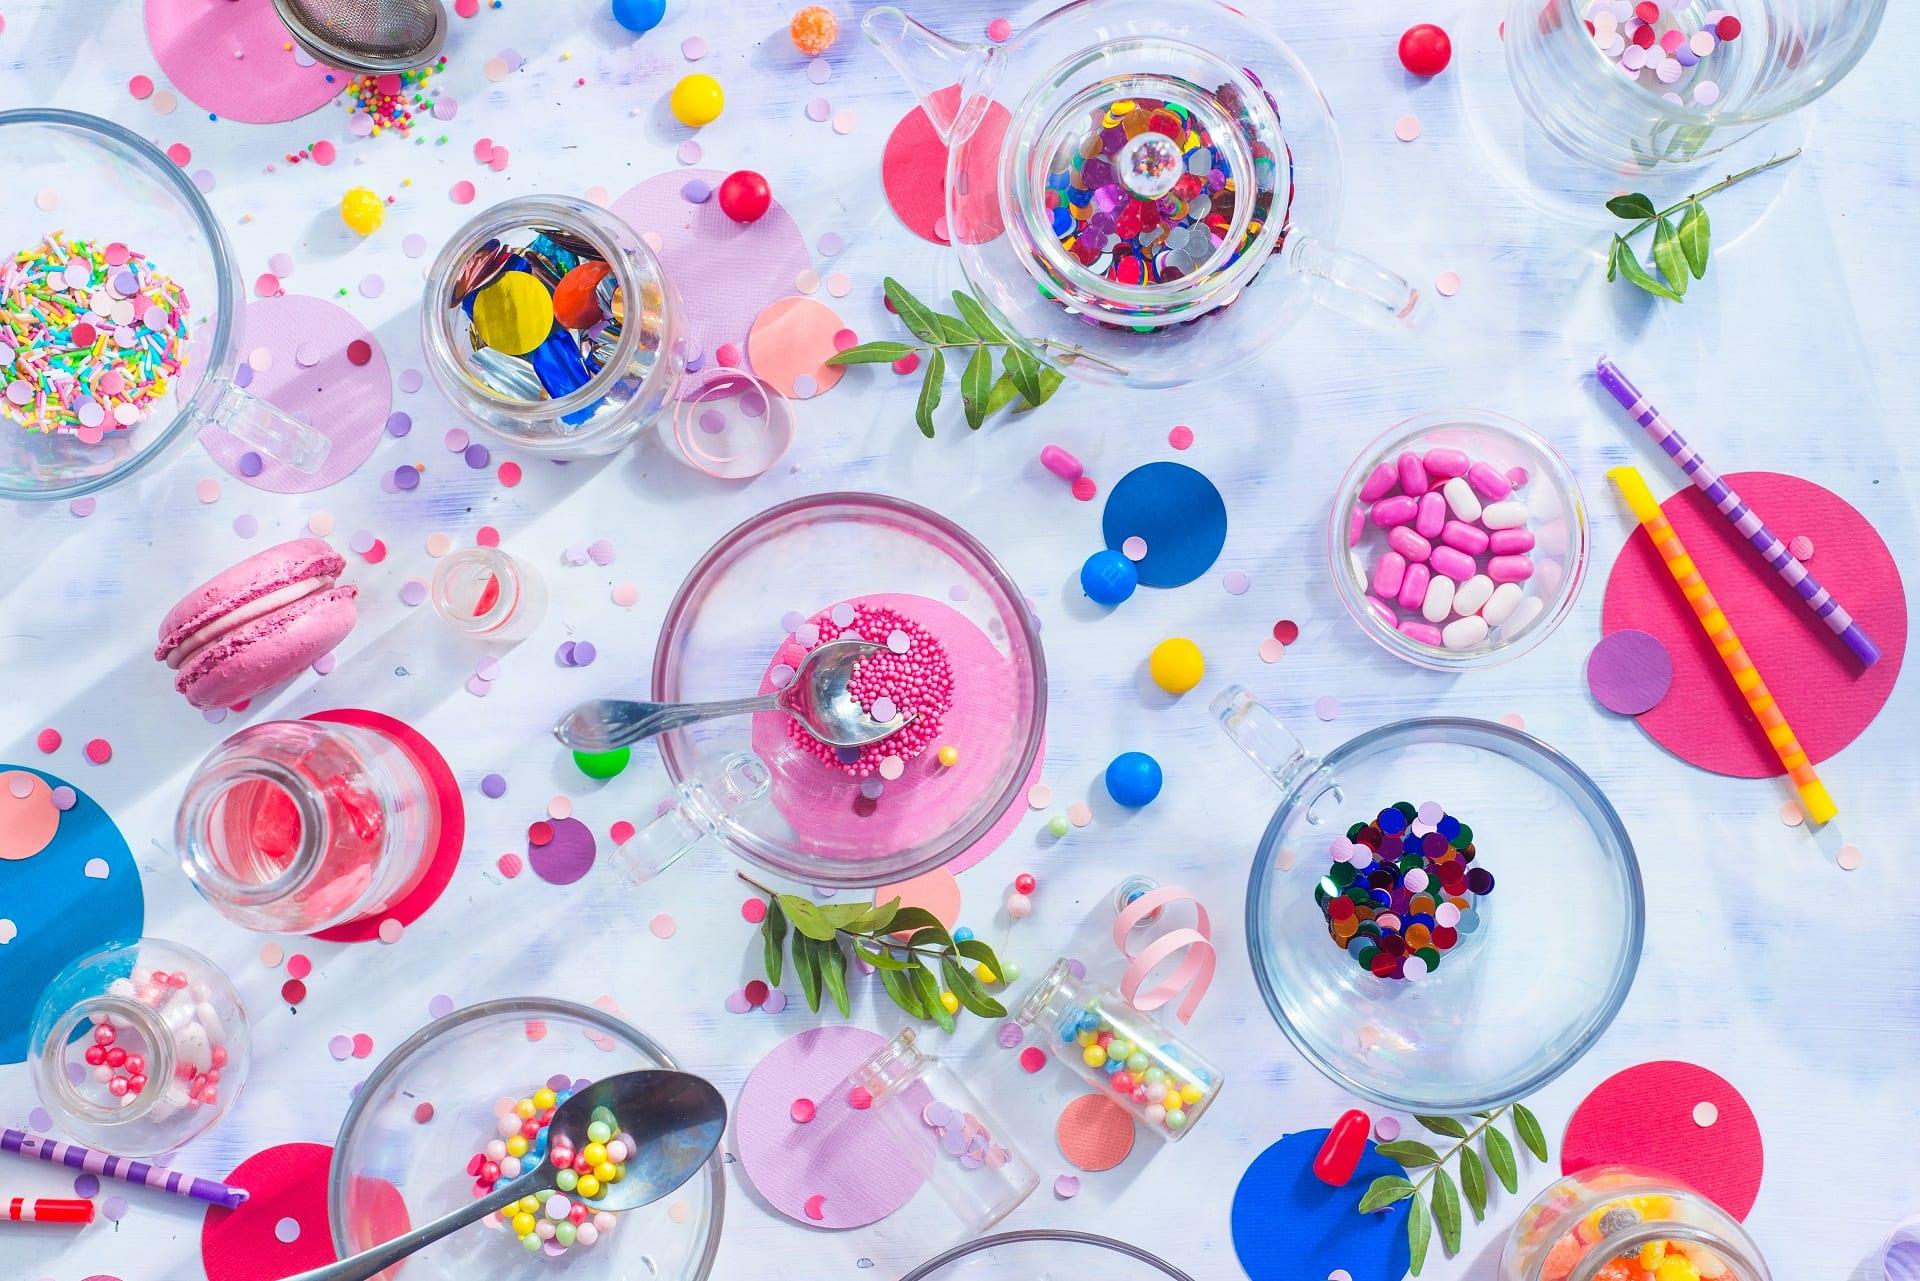 sprinkles confetti candies macaroons and birthday RGZQEXB - Feest